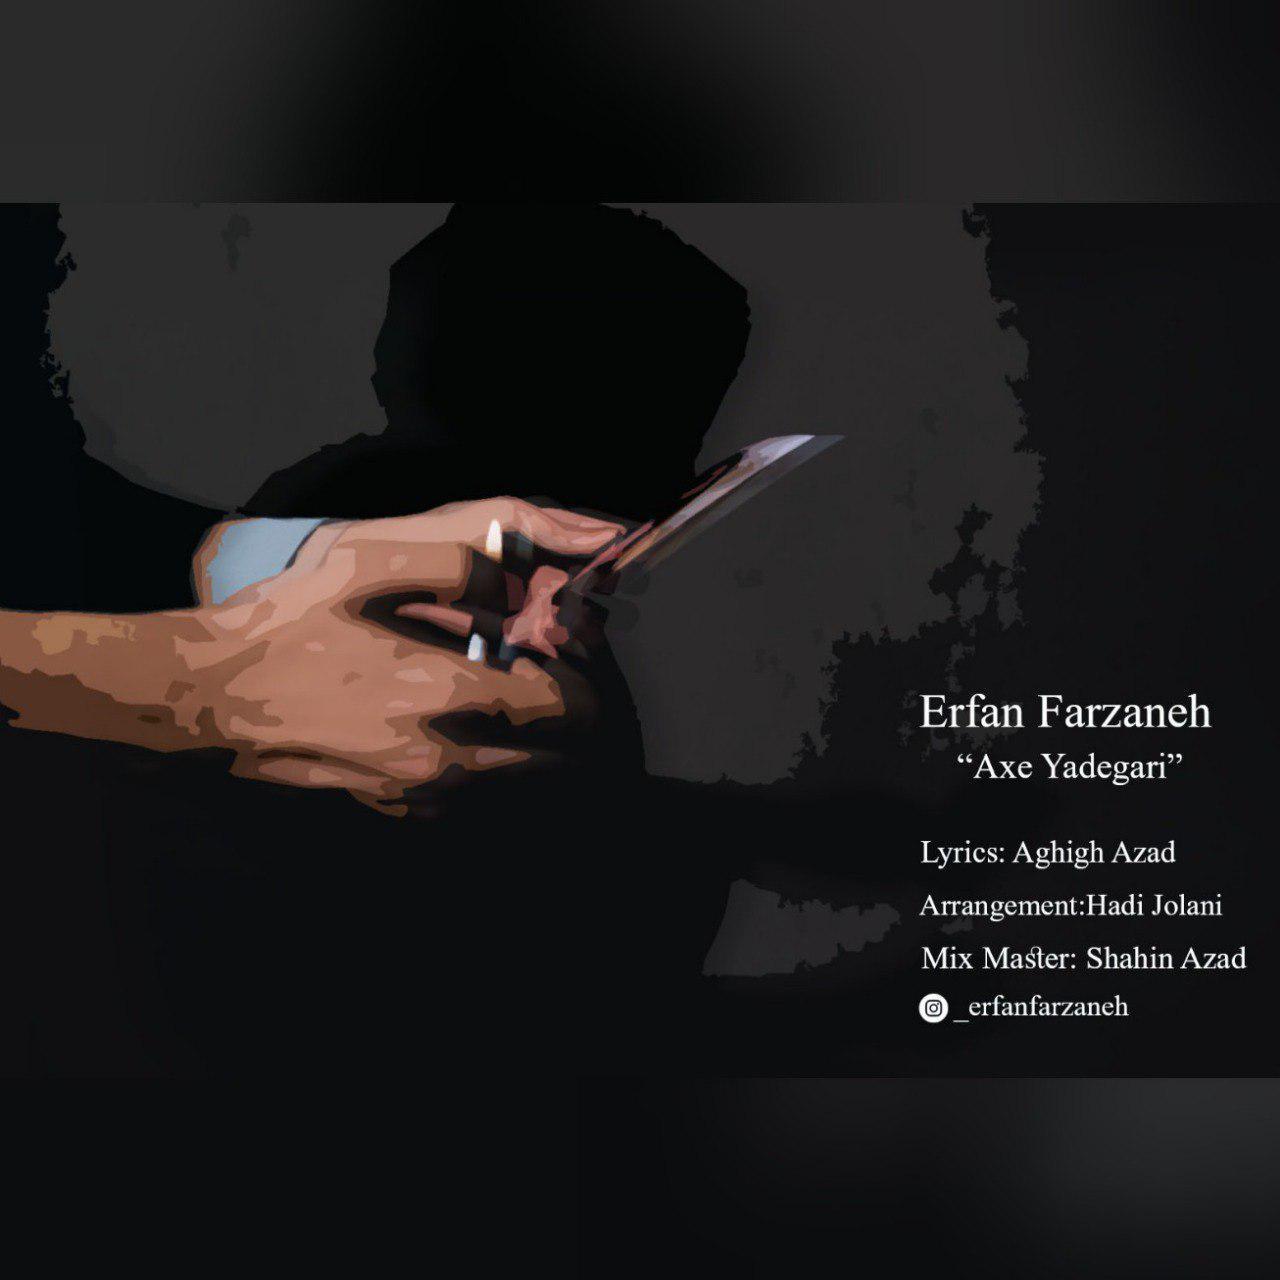 Erfan Farzaneh – Axe Yadegari